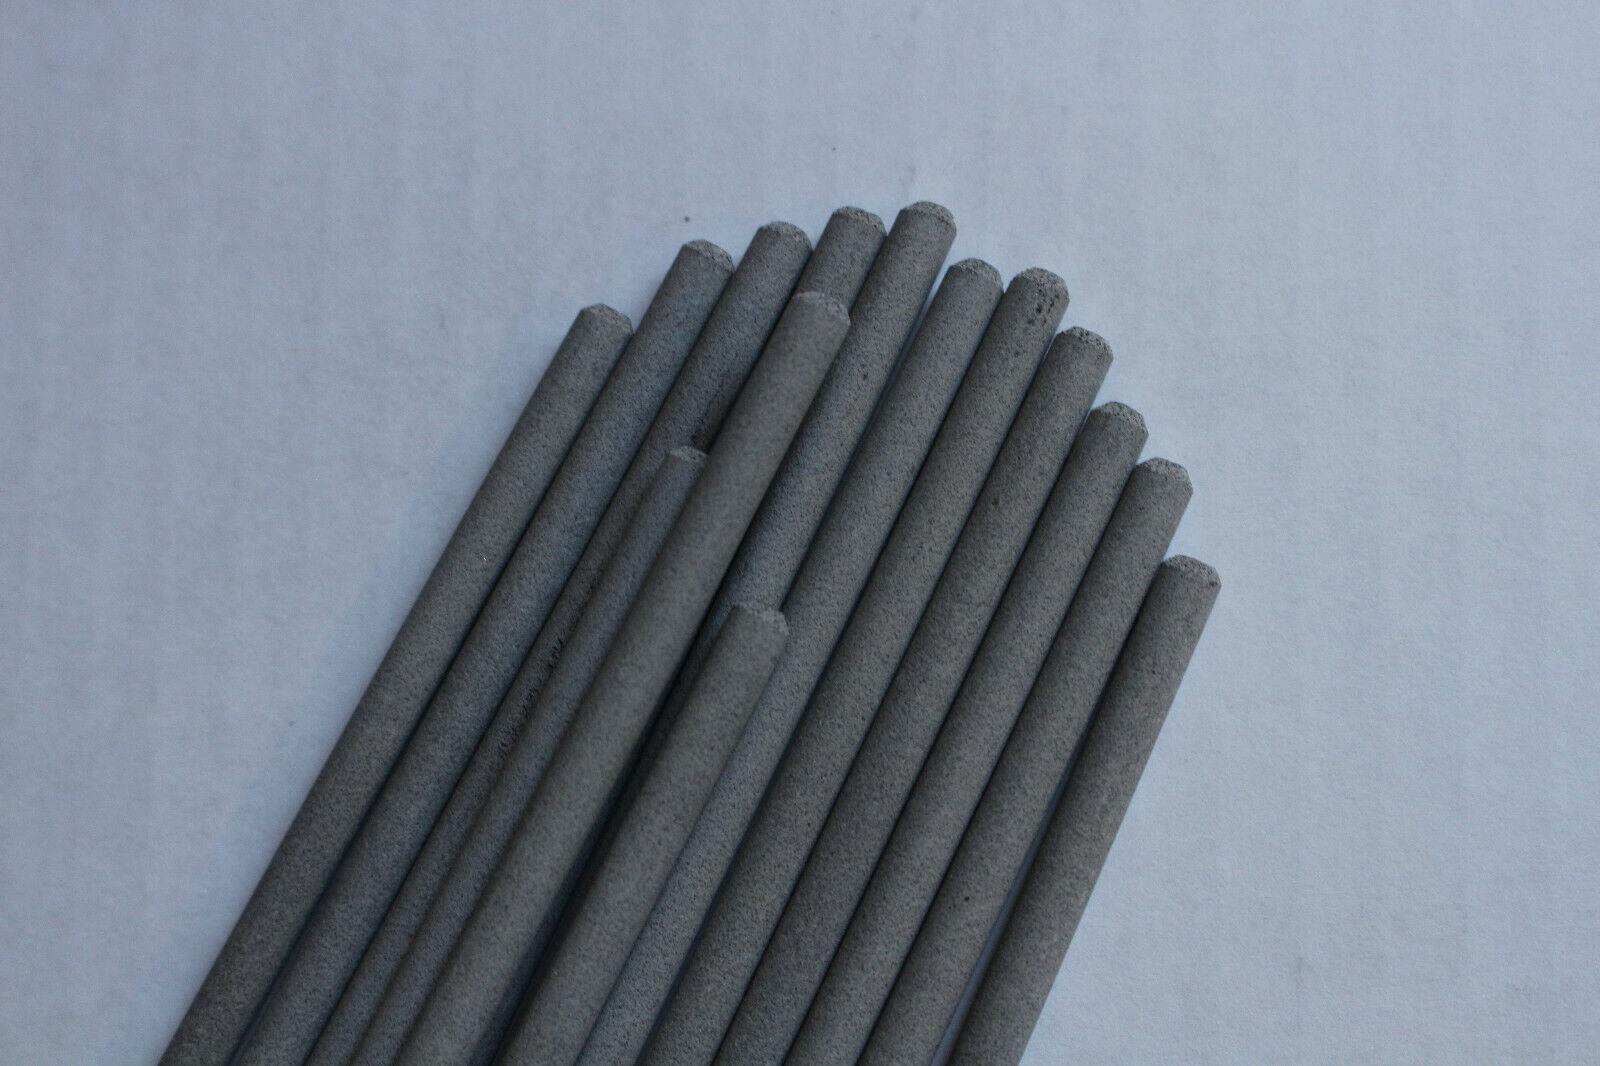 Stabelektrode Stahl Schweißelektroden Fincord Universal RR6 RR12